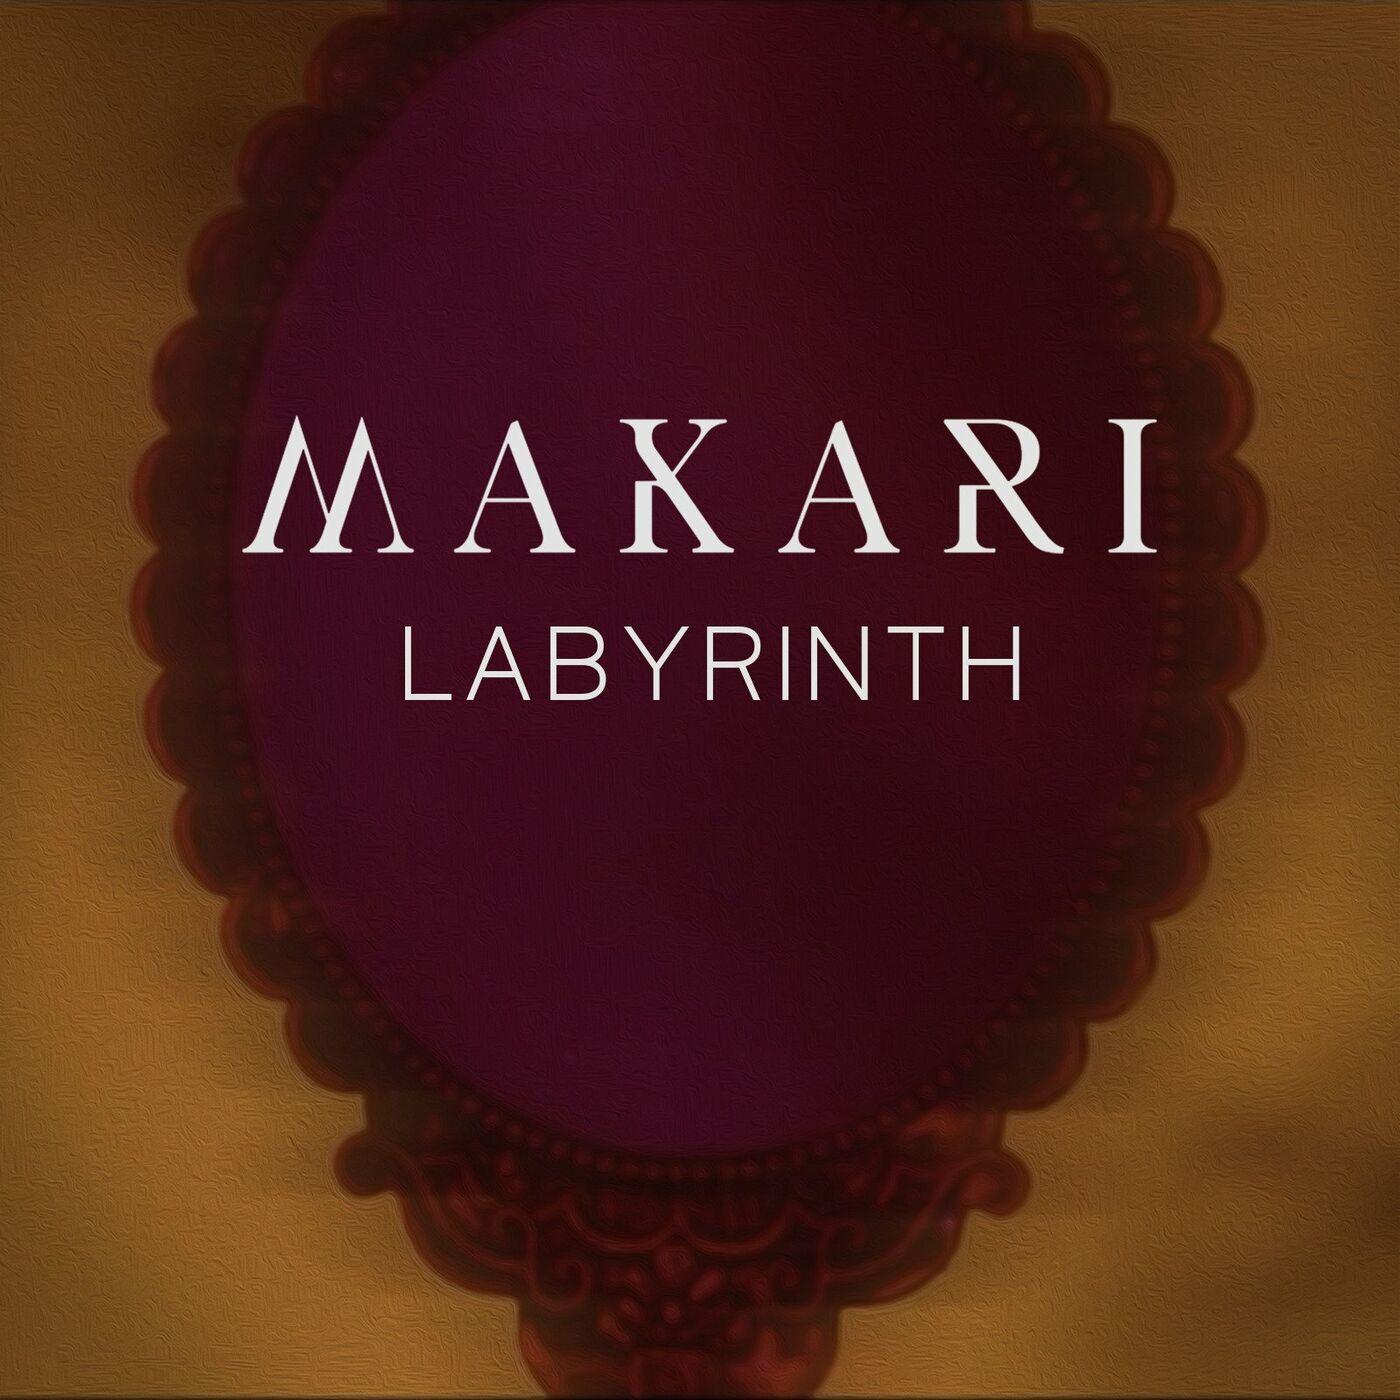 Makari - Labyrinth [single] (2020)